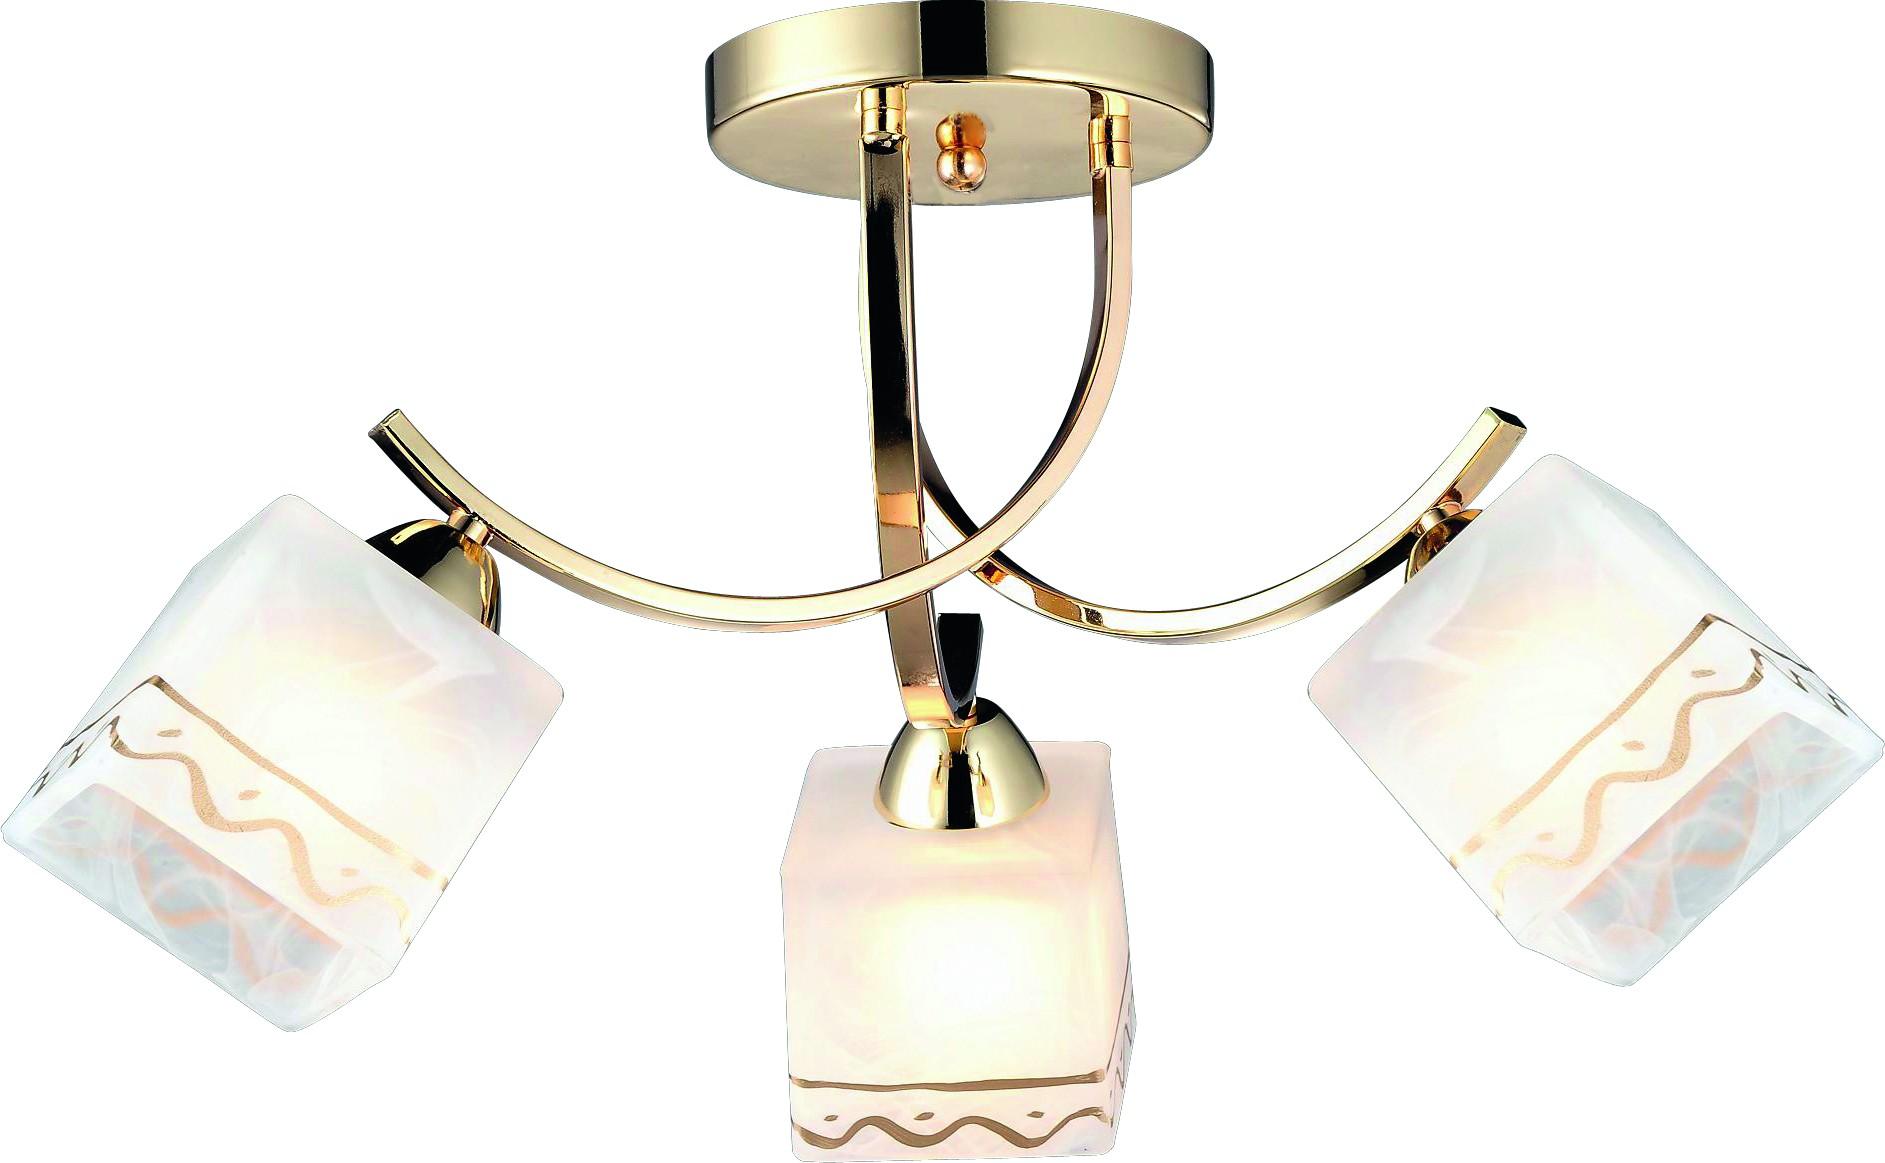 Люстра Arte lamp A6119pl-3go торшер arte lamp armonico a5008pn 3go